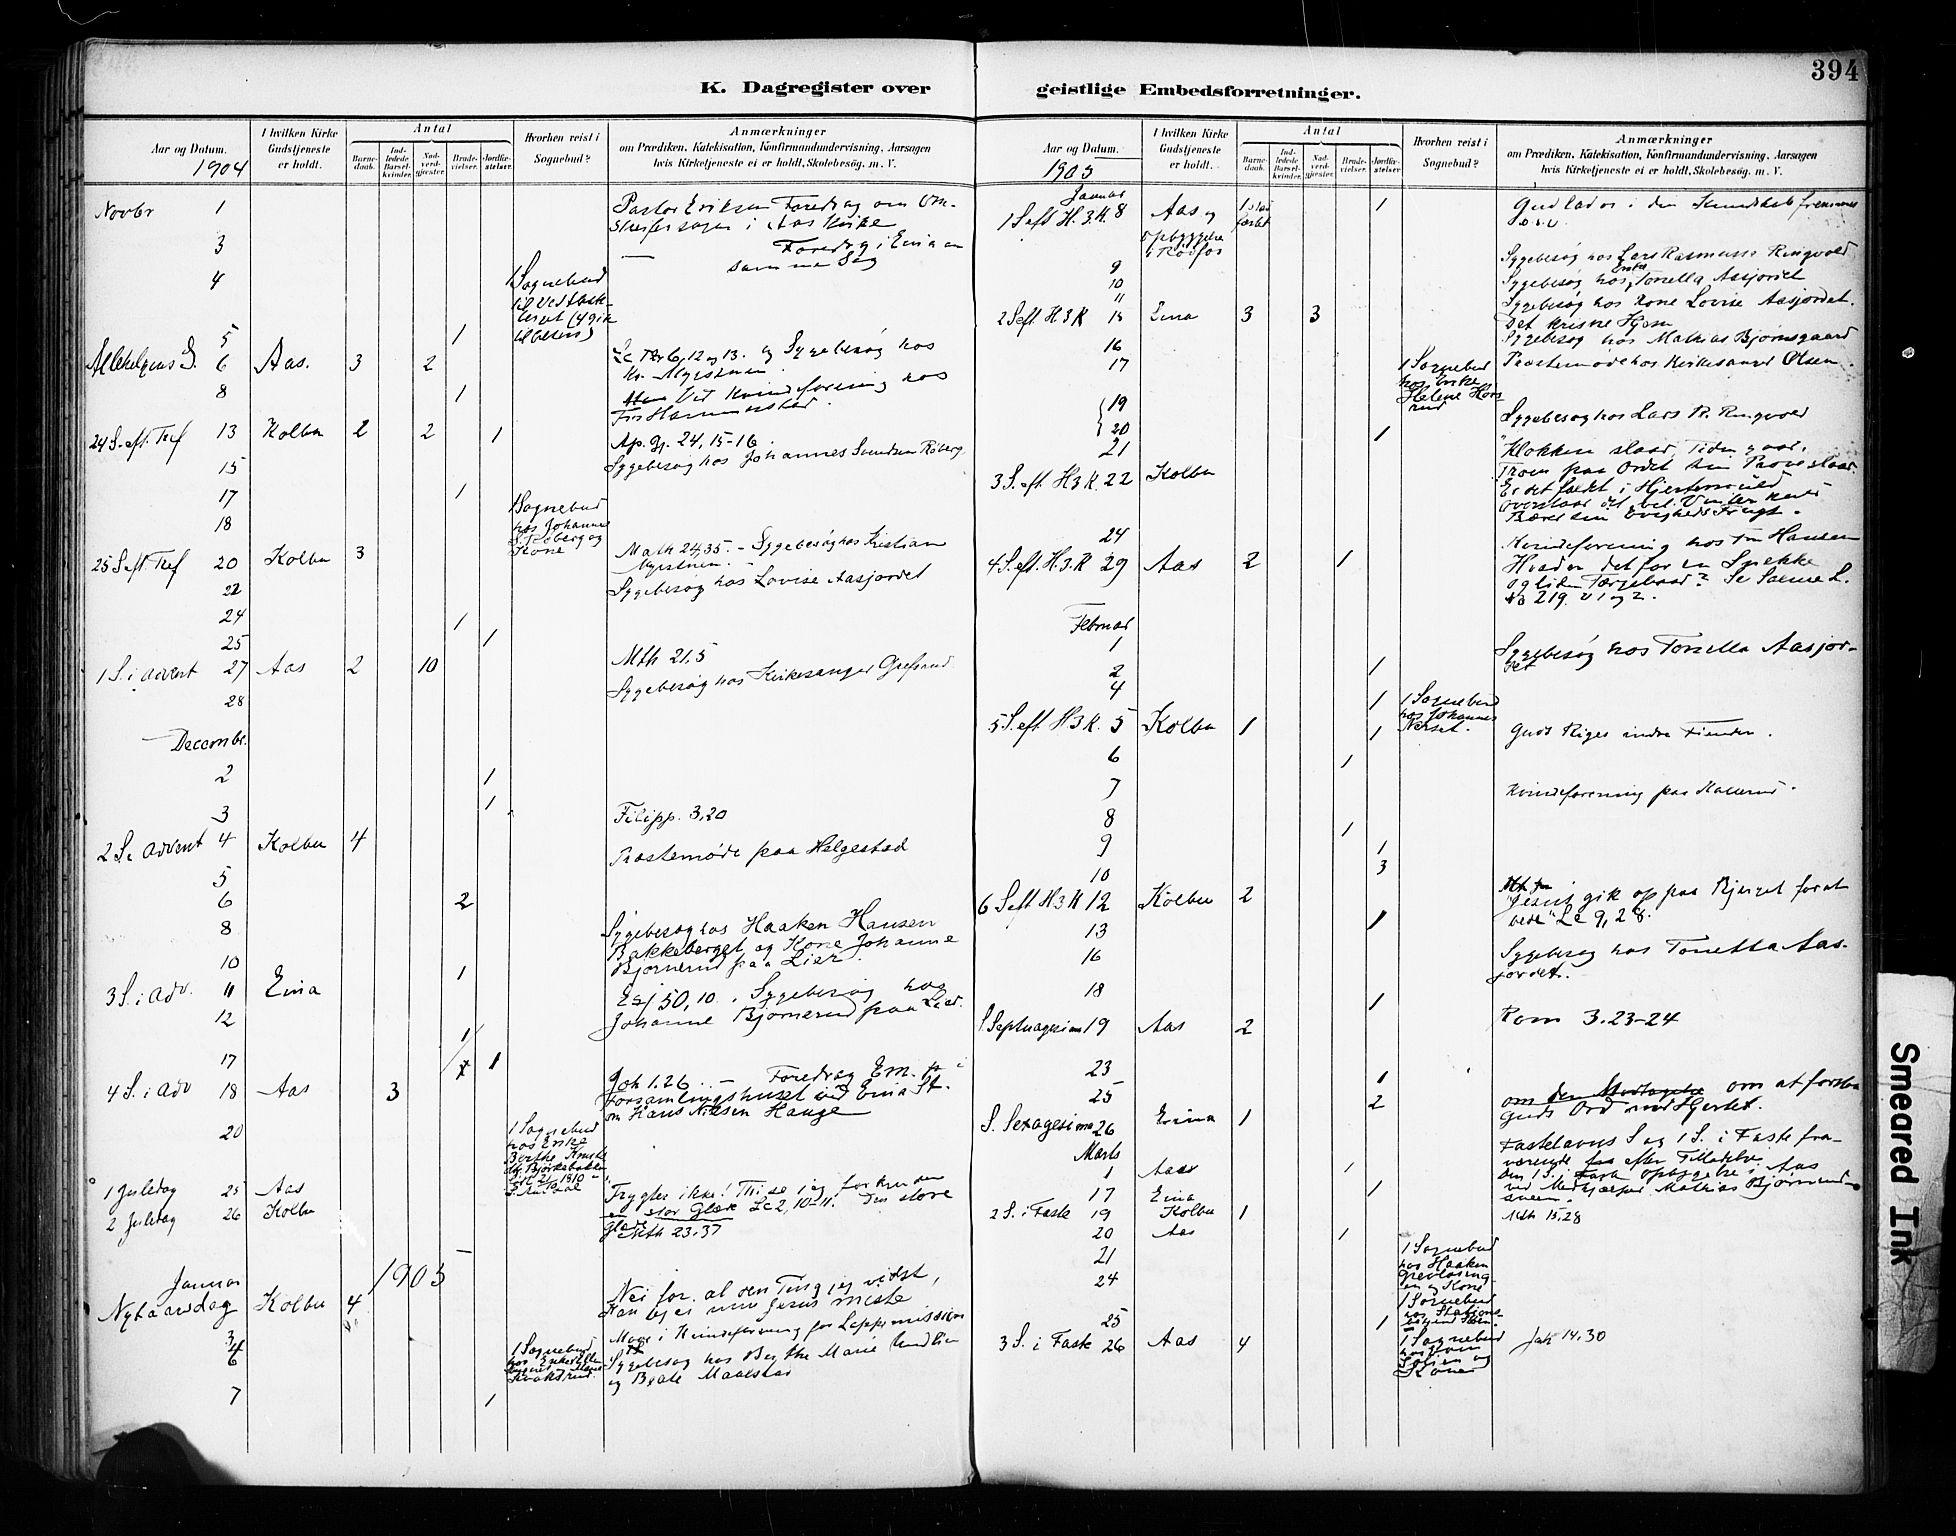 SAH, Vestre Toten prestekontor, H/Ha/Haa/L0011: Ministerialbok nr. 11, 1895-1906, s. 394